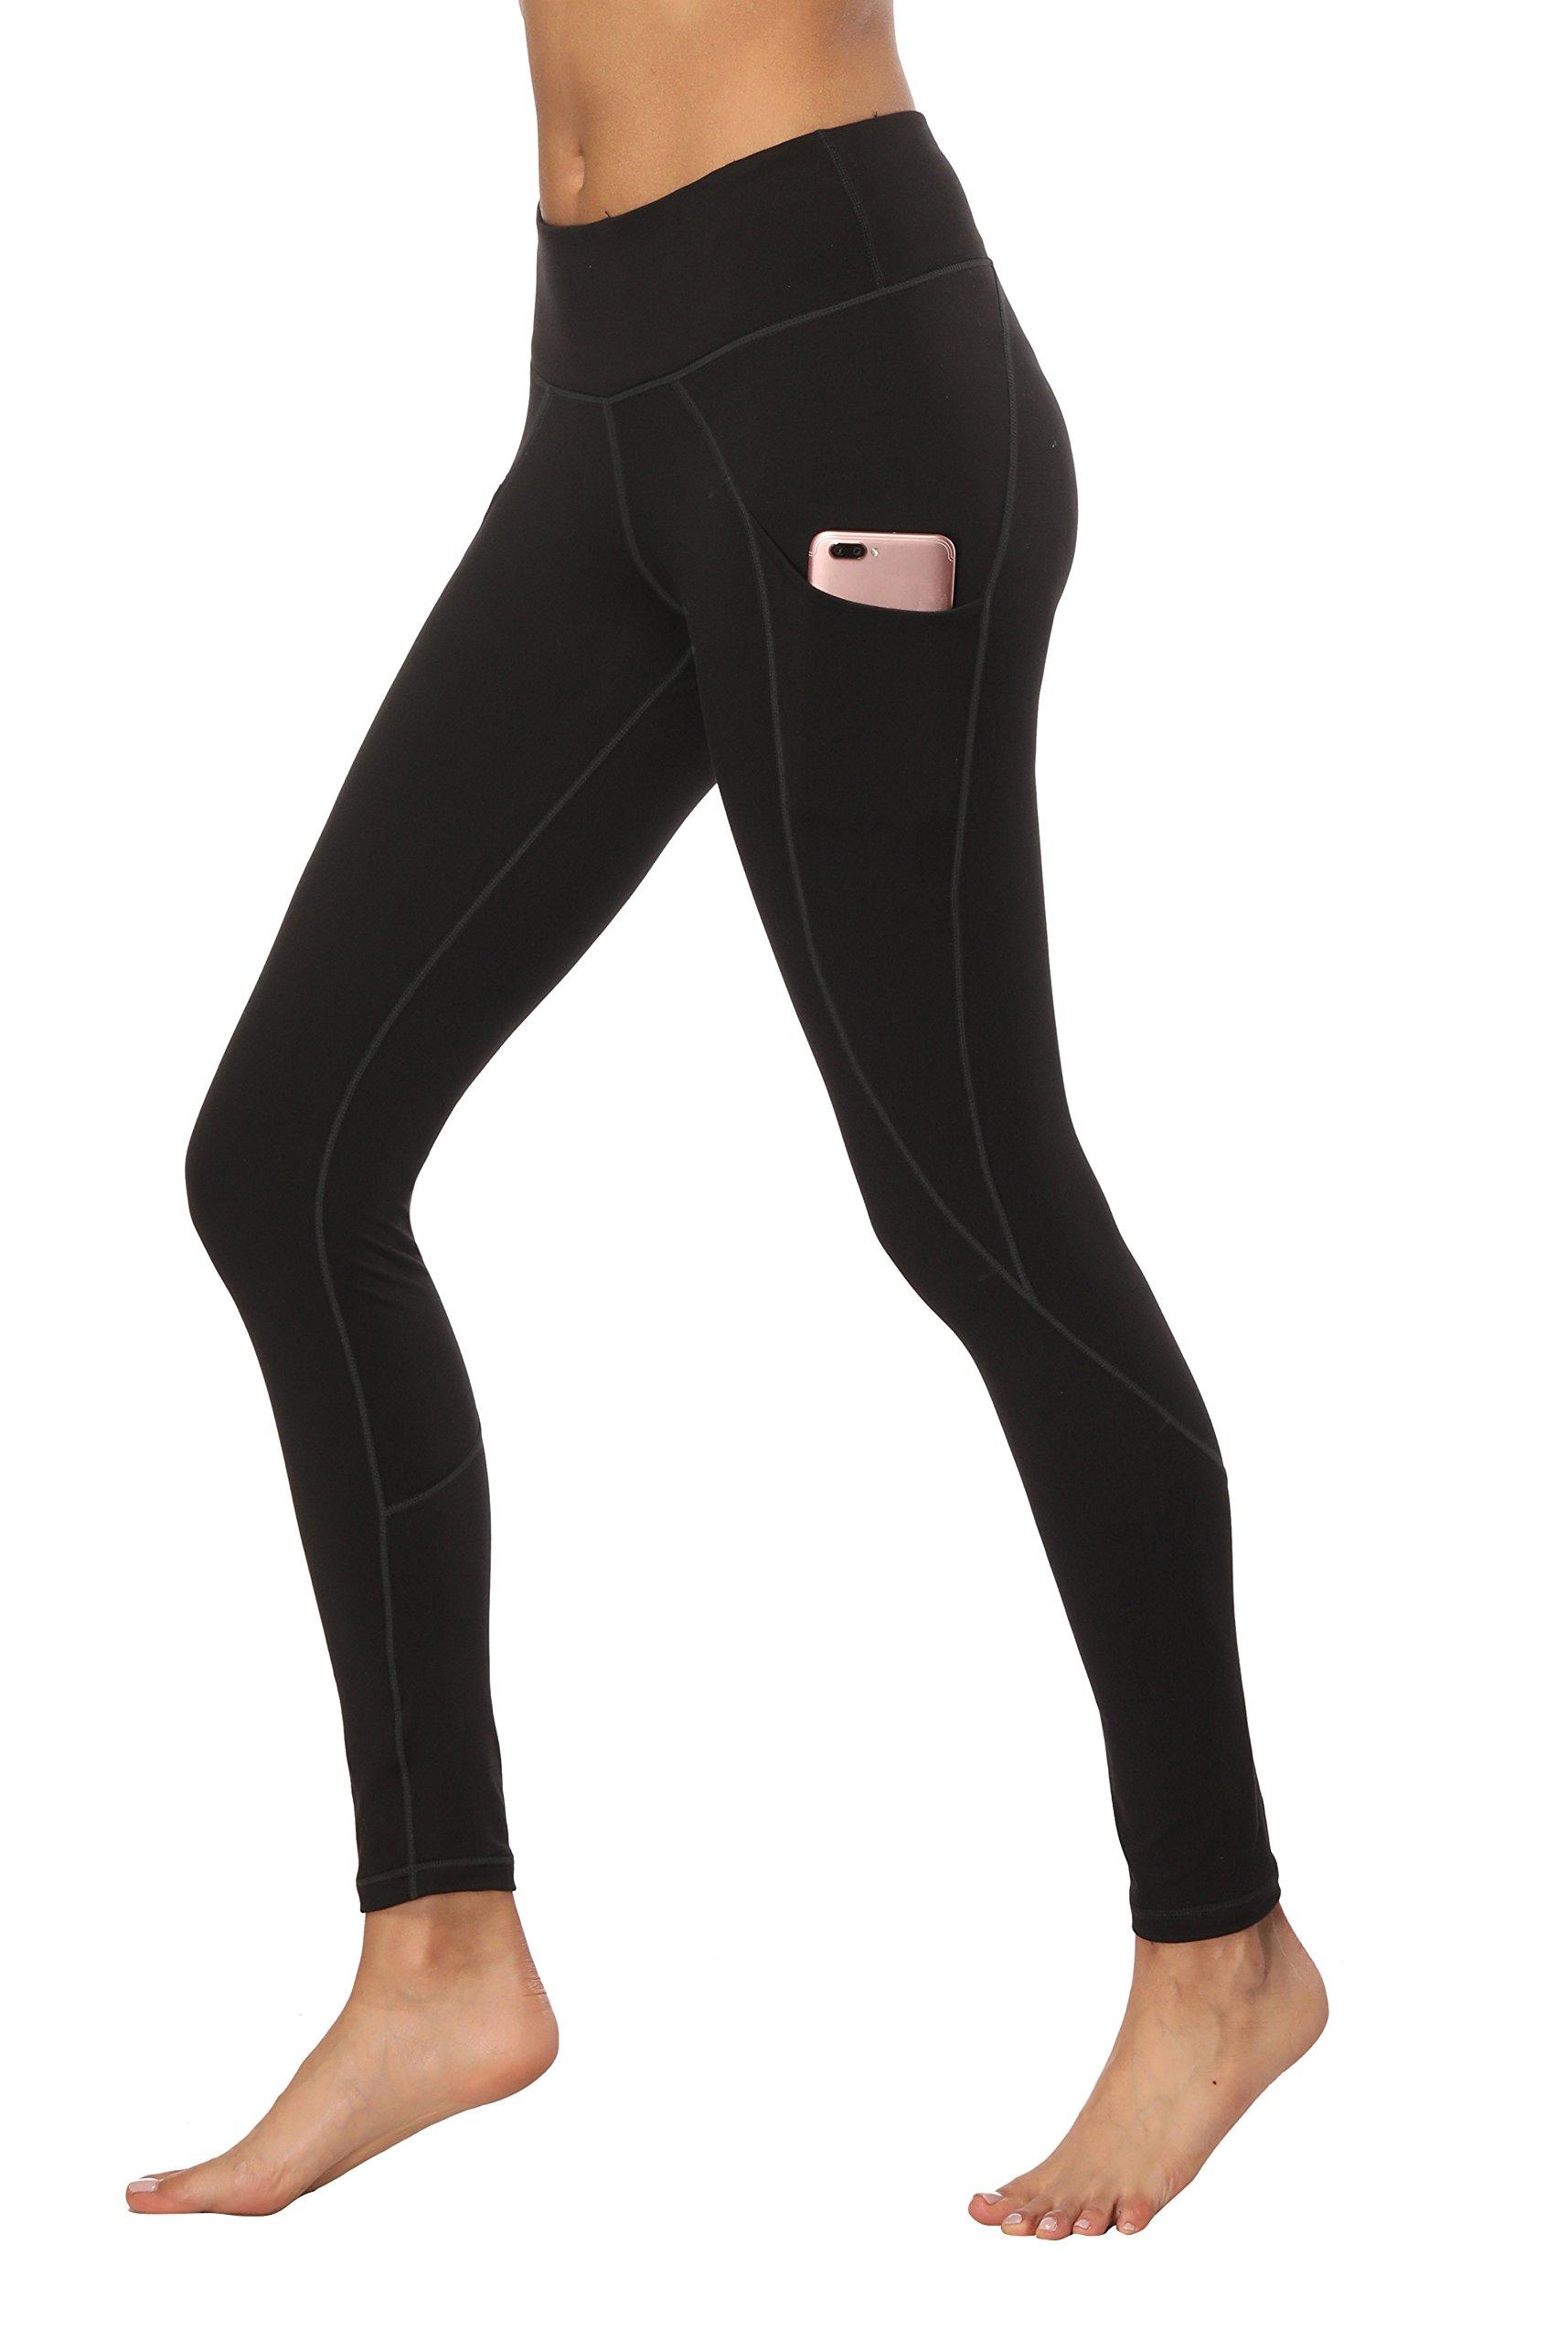 HKJIEVSHOP Yoga Pants with Pockets, High Waist Yoga Pants Tummy Control Workout Running 4 Way Stretch Pocket Leggings